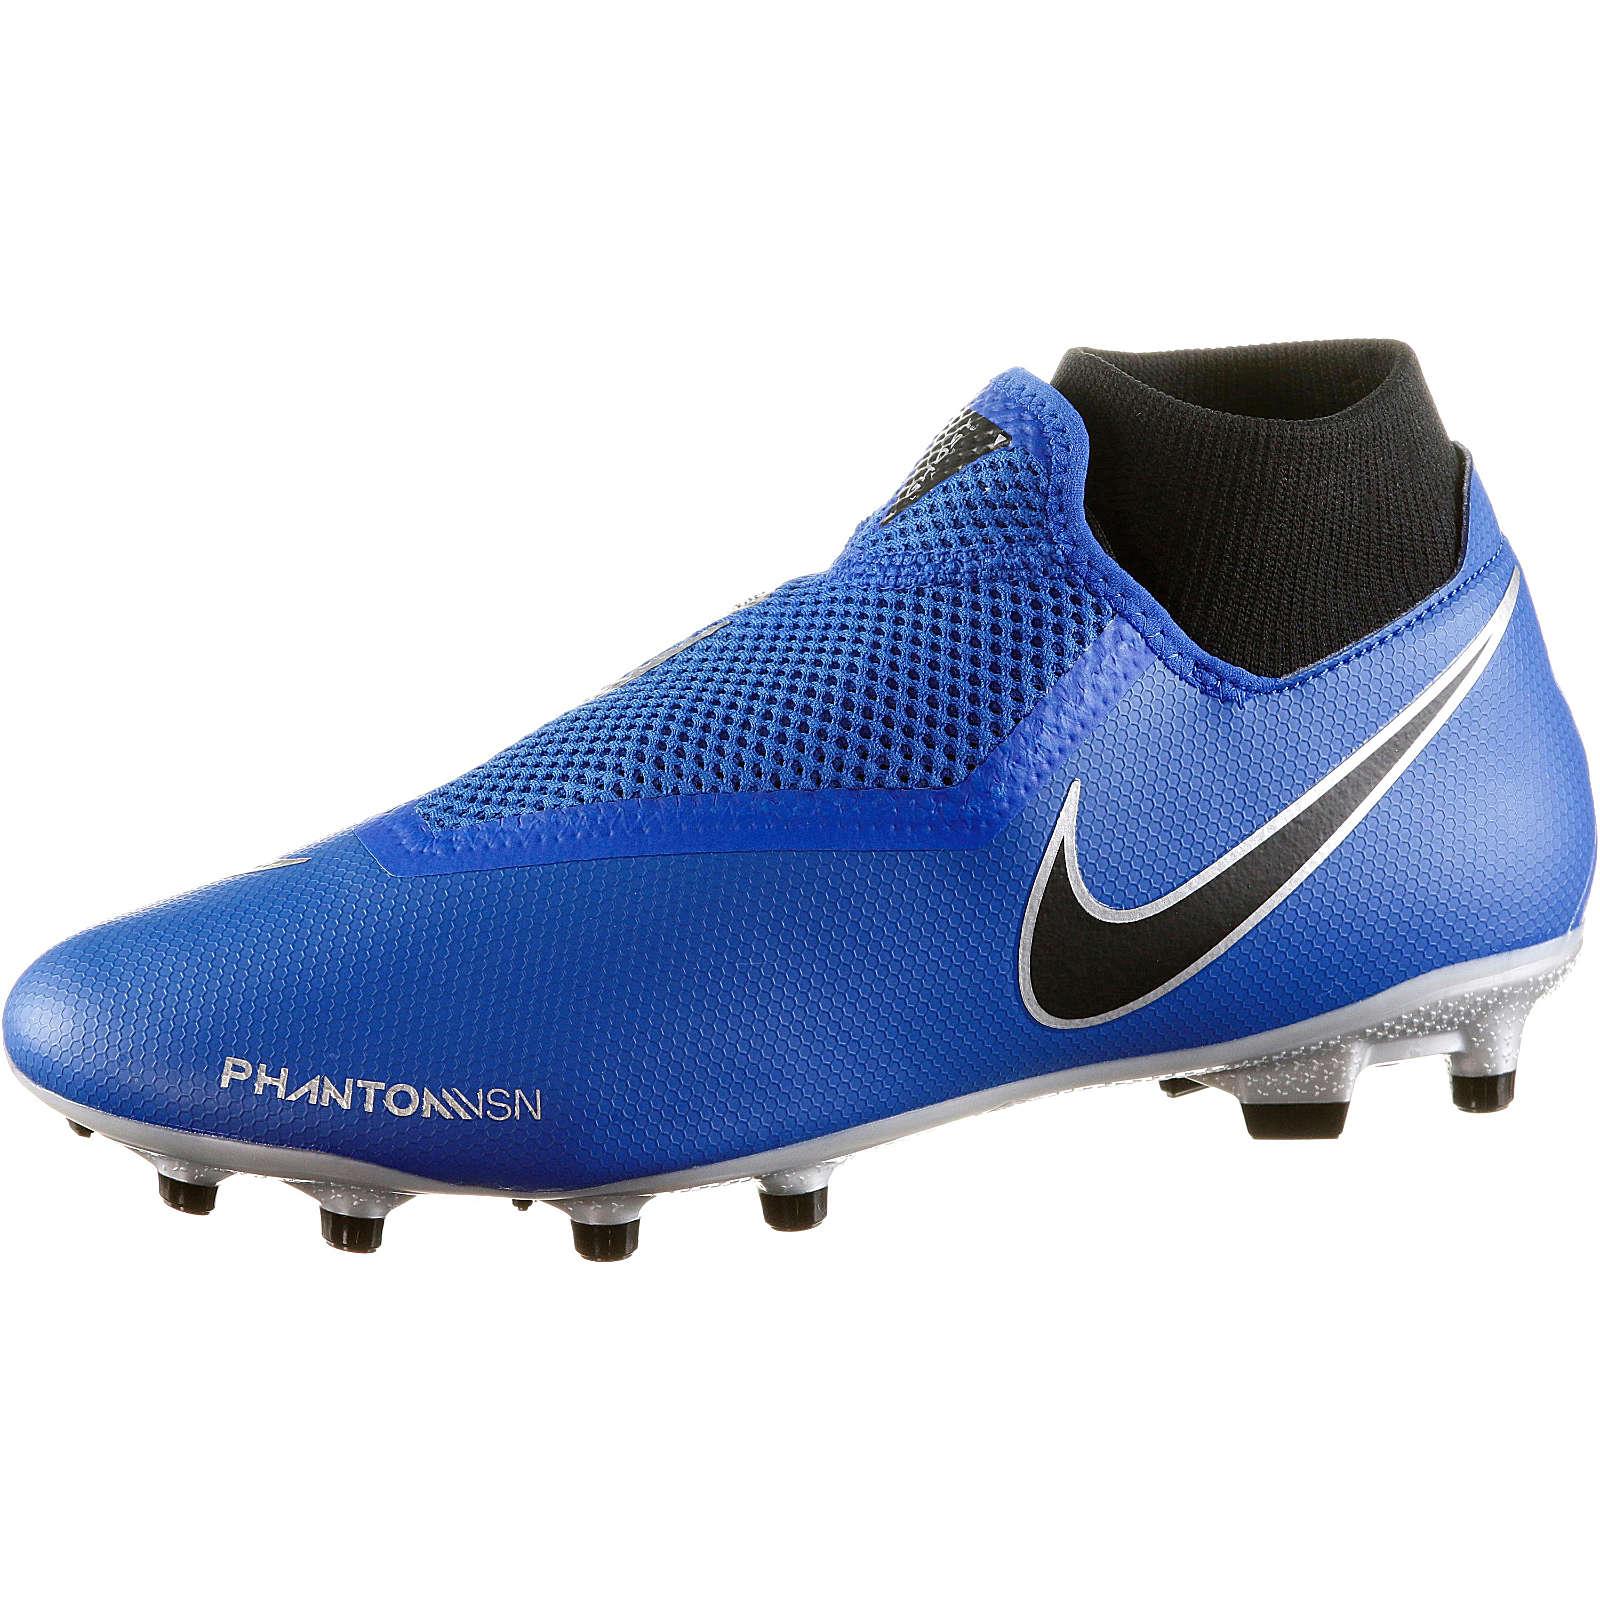 Nike Performance Fußballschuhe PHANTOM VSN ACADEMY DF FG/MG Fußballschuhe blau Damen Gr. 39